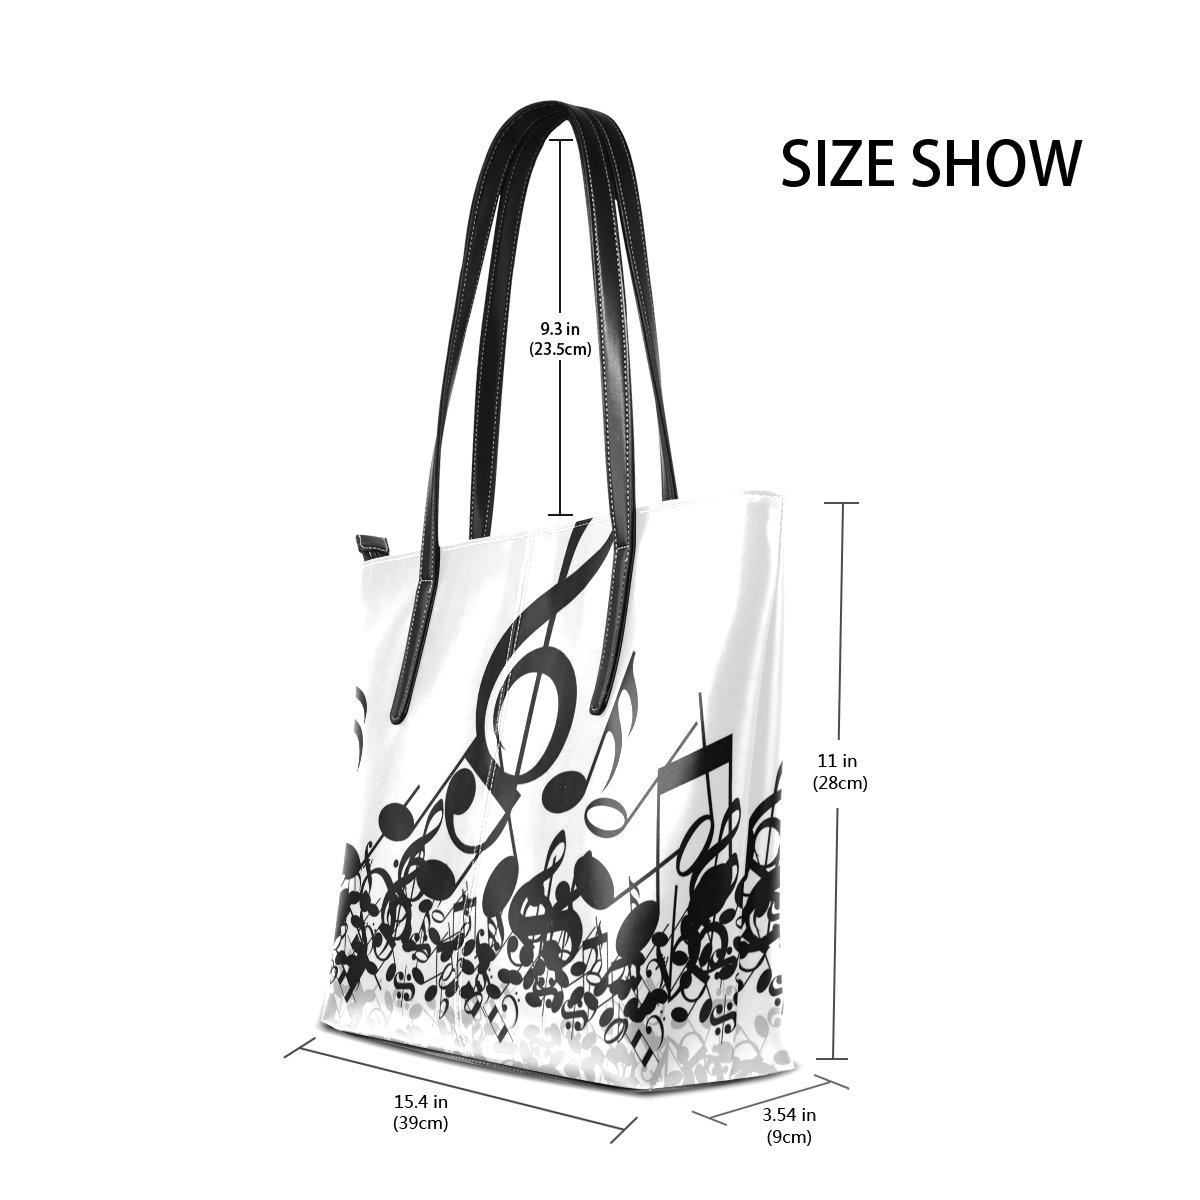 48f7bad7ceca DEYYA Music Notes Piano Women's Leather Tote Shoulder Bags Handbags